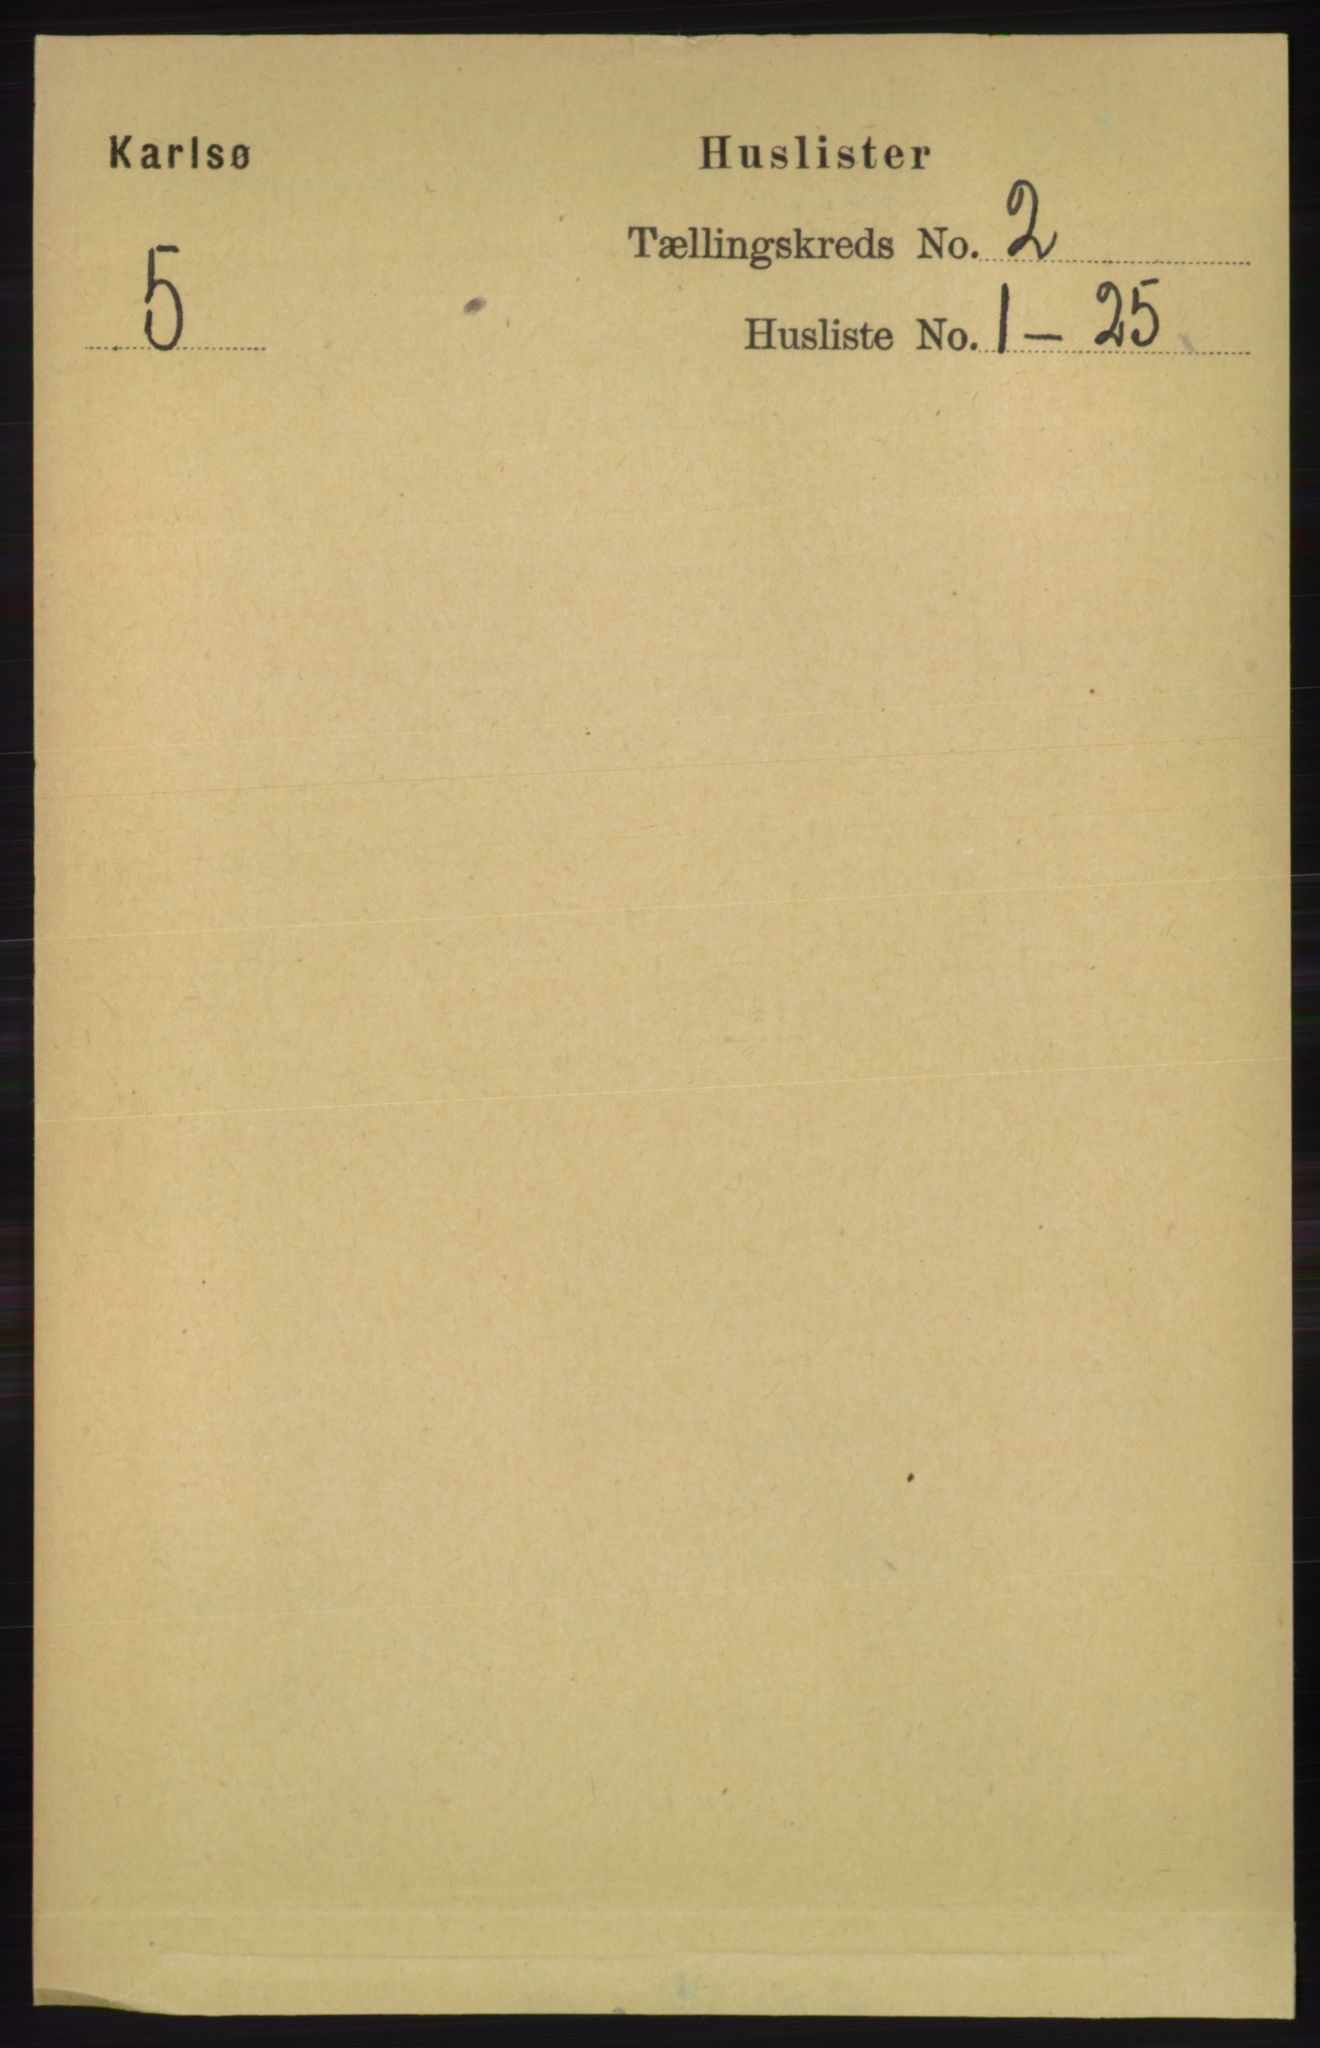 RA, Folketelling 1891 for 1936 Karlsøy herred, 1891, s. 374